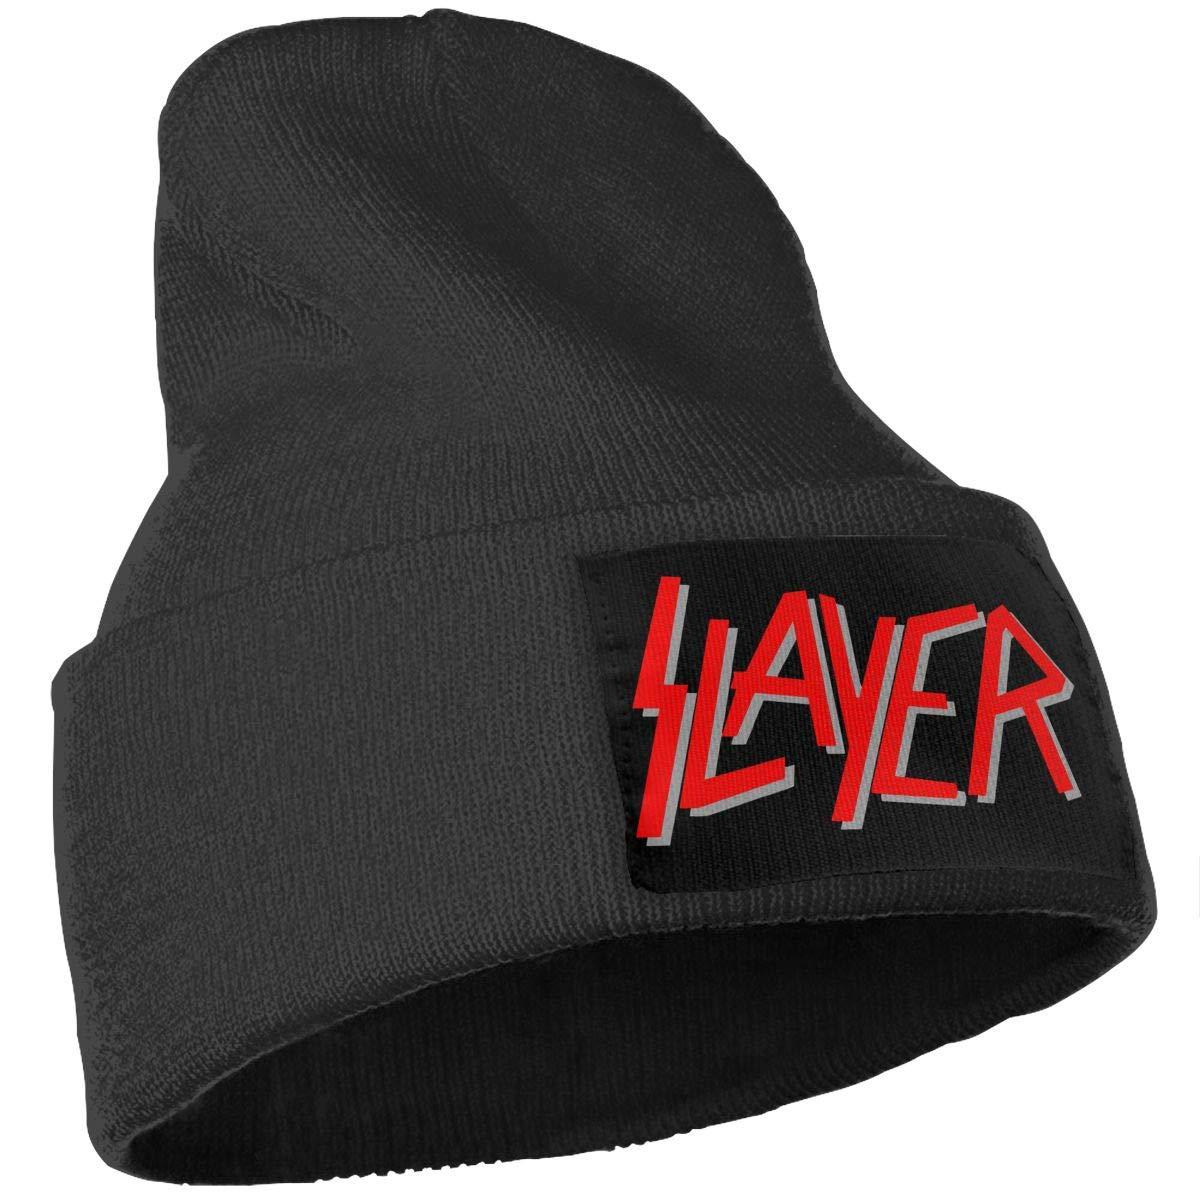 Knit Hat Slayer Rock Band Beanie Winter Hats for Men Women